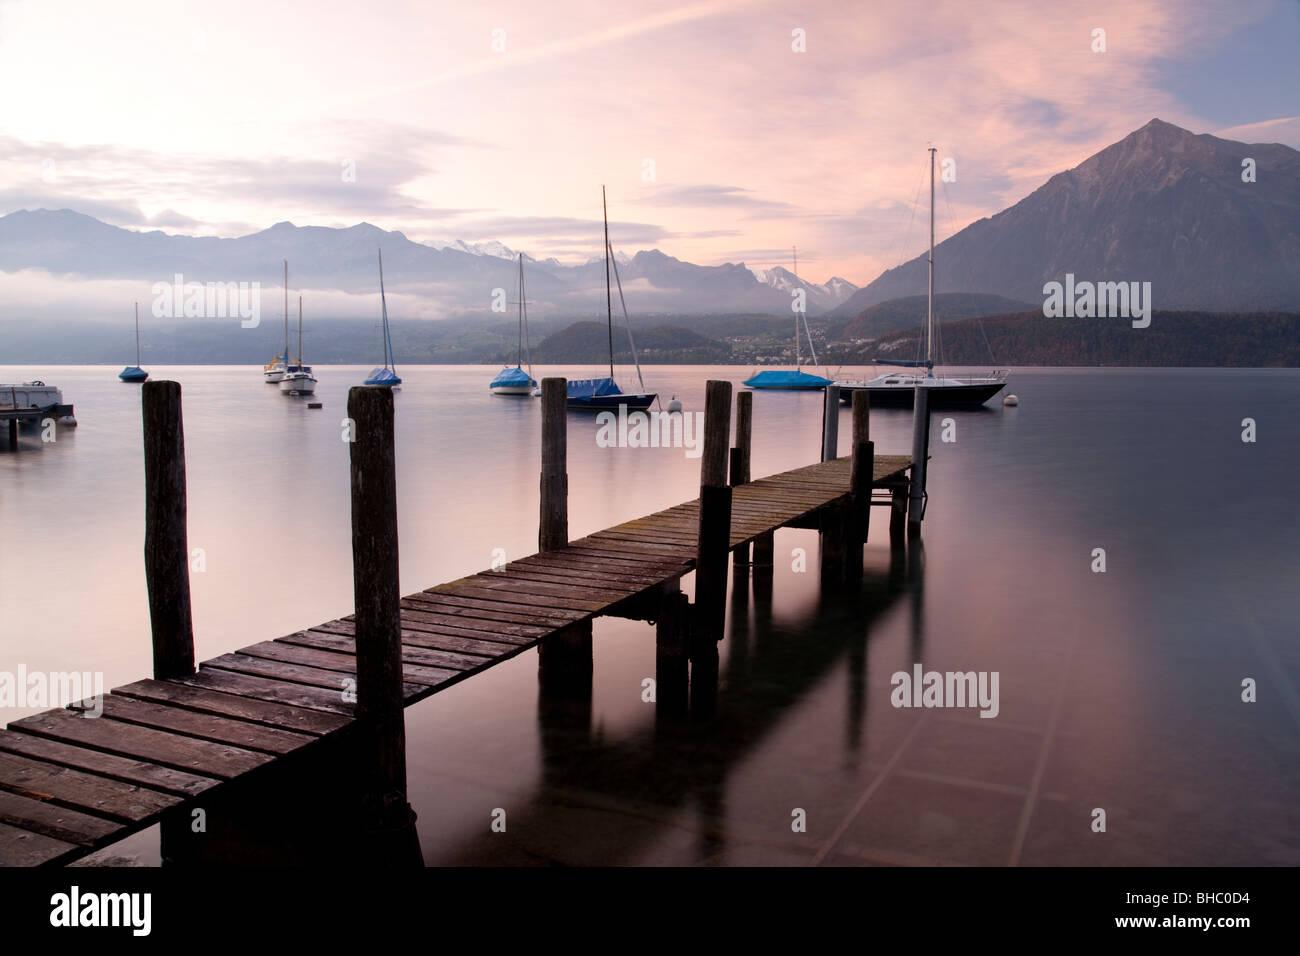 Wooden Landing Jetty on 'Lake Thun' Switzerland - Stock Image